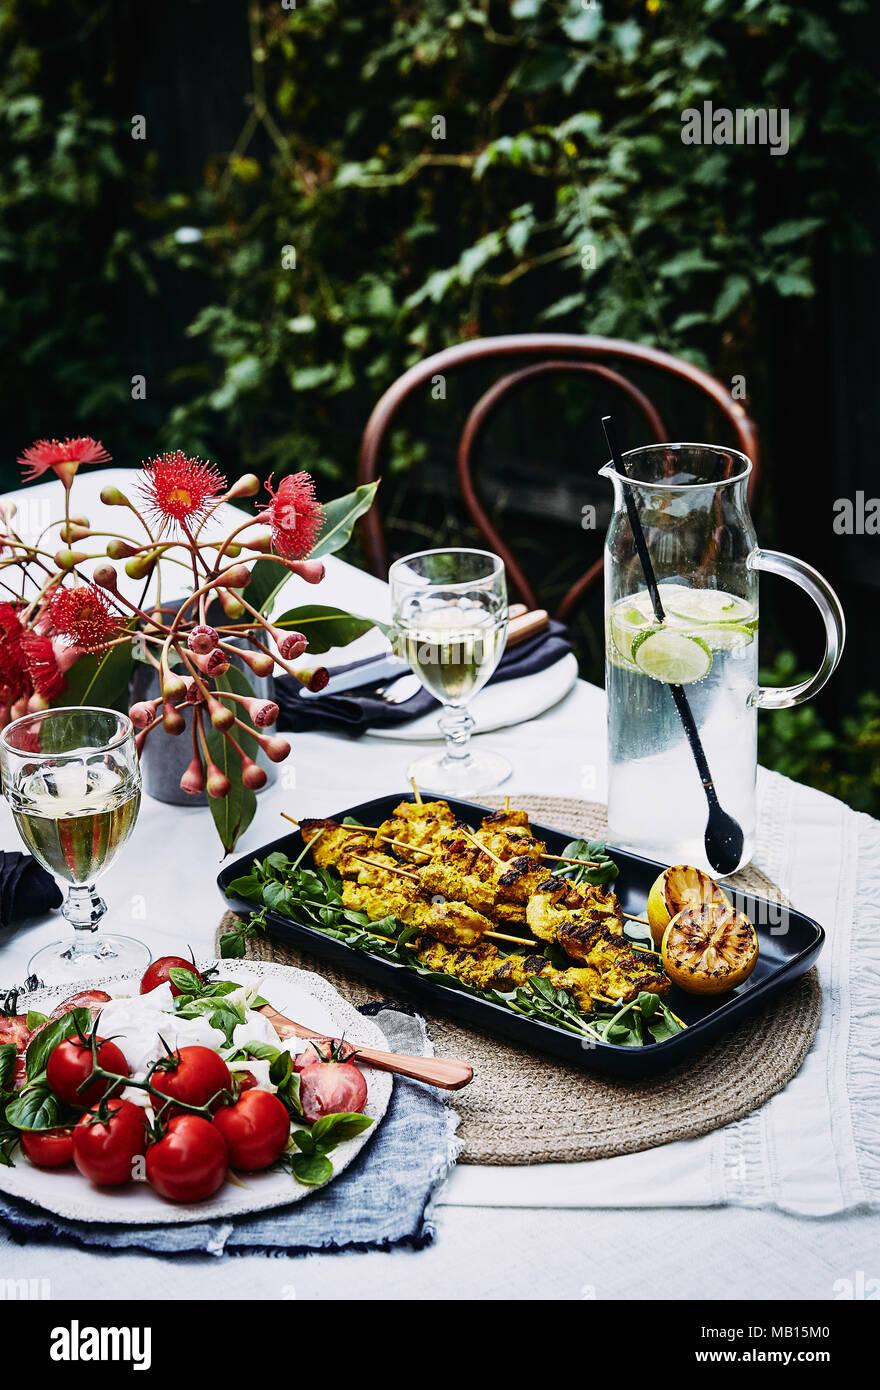 summer picnic: mediterranean salad, turmeric chicken skewers. - Stock Image